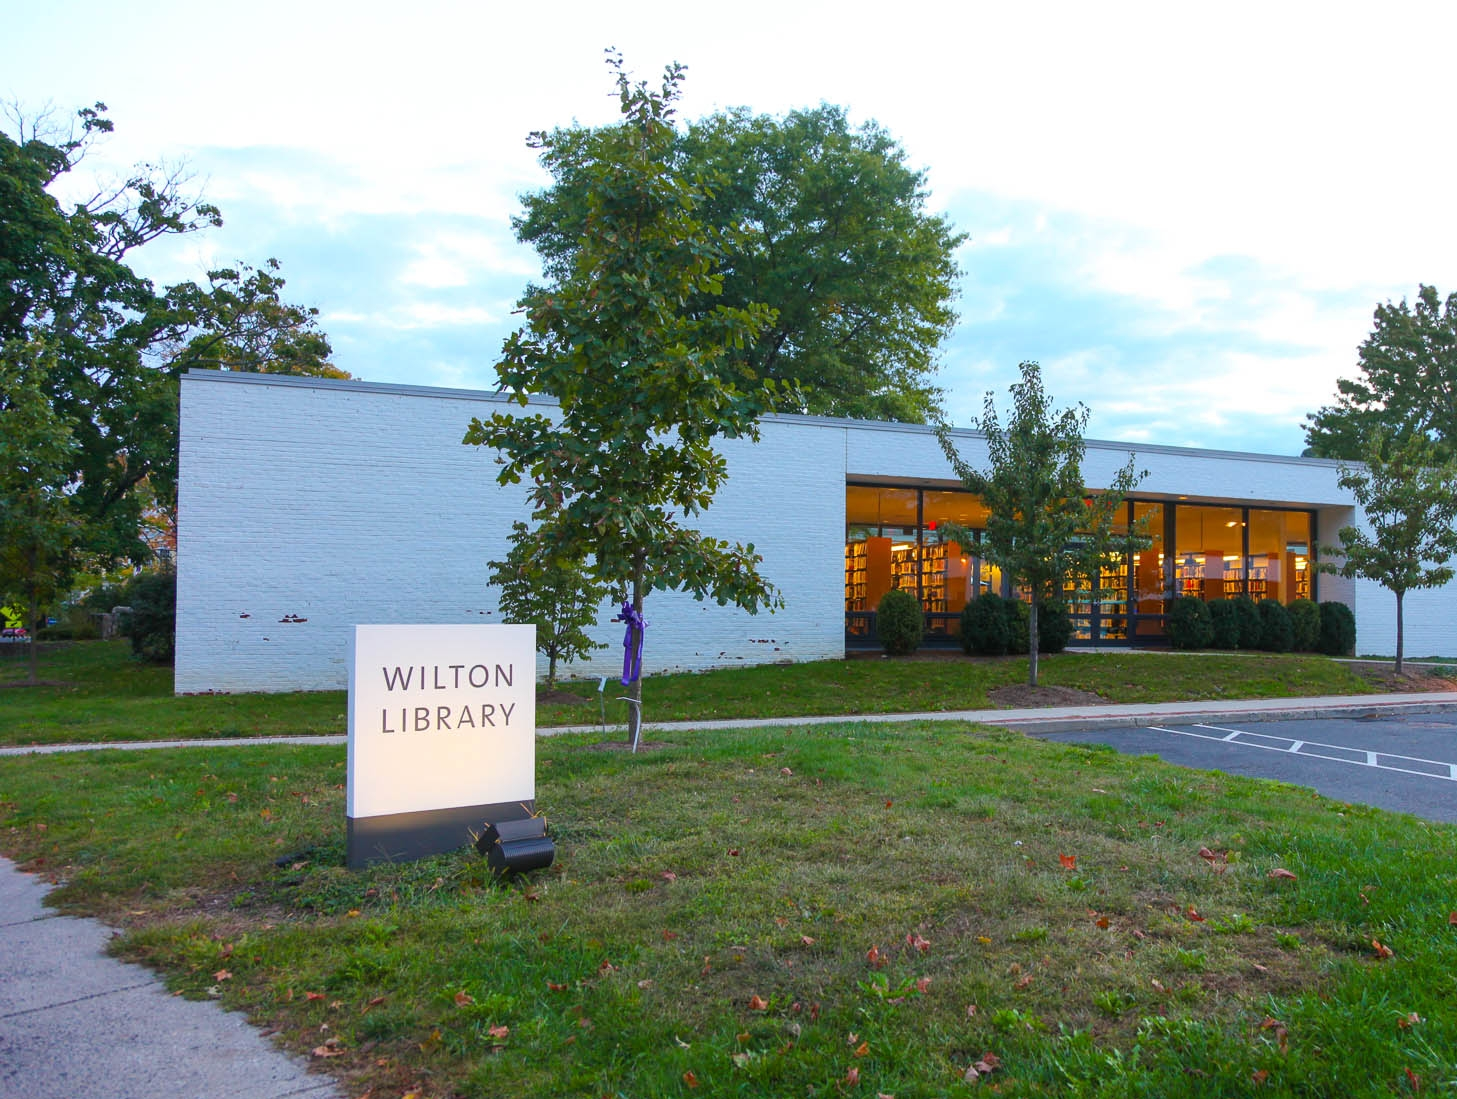 wilton library.jpg